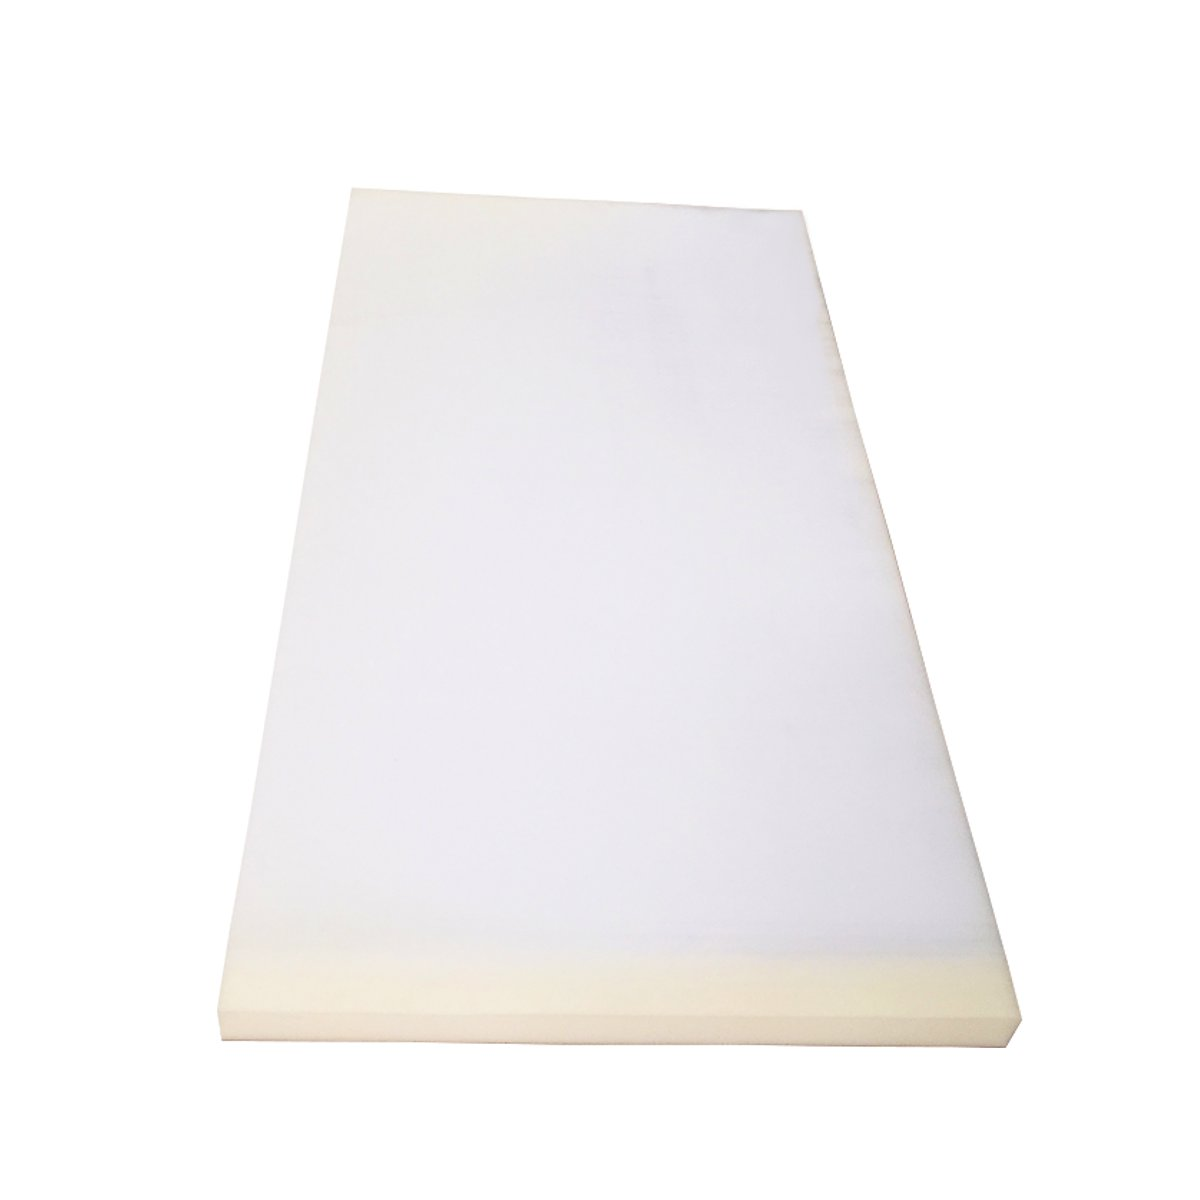 75x40cm High Density Upholstery Cushion Foam Chair Sofa Seat Pad Sheet